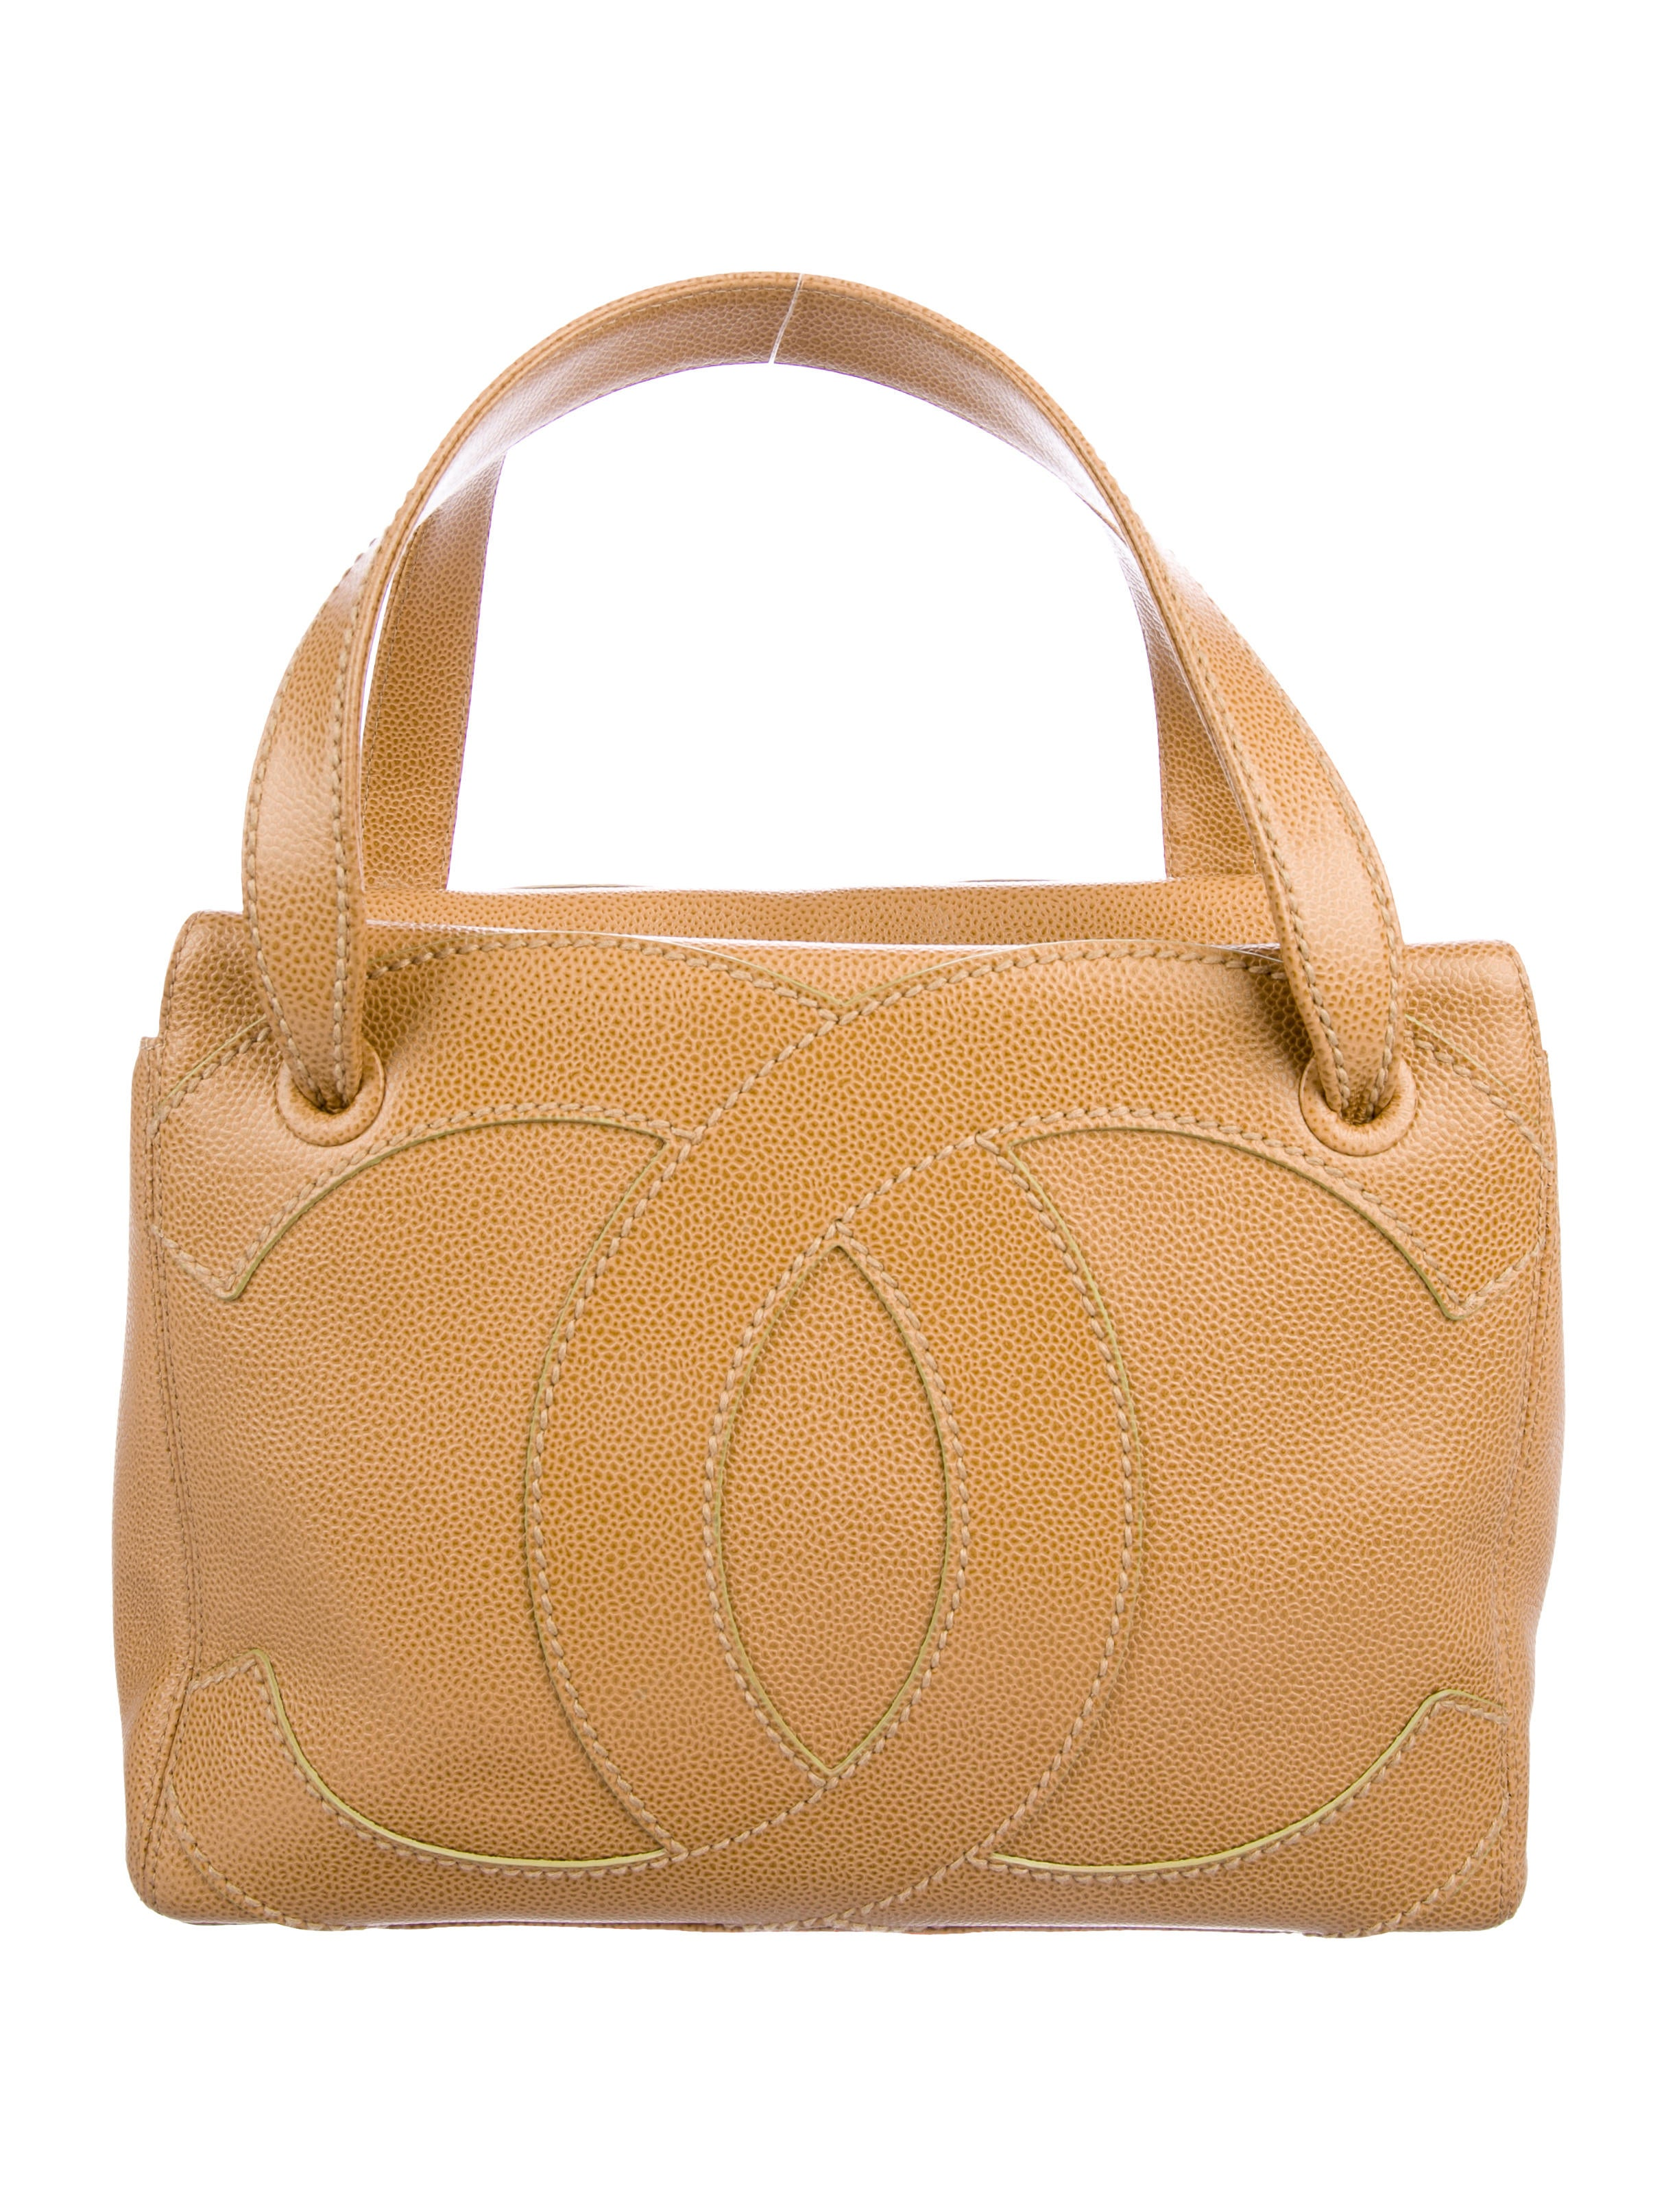 2cca71479407 Chanel CC Surpique Tote - Handbags - CHA305002   The RealReal